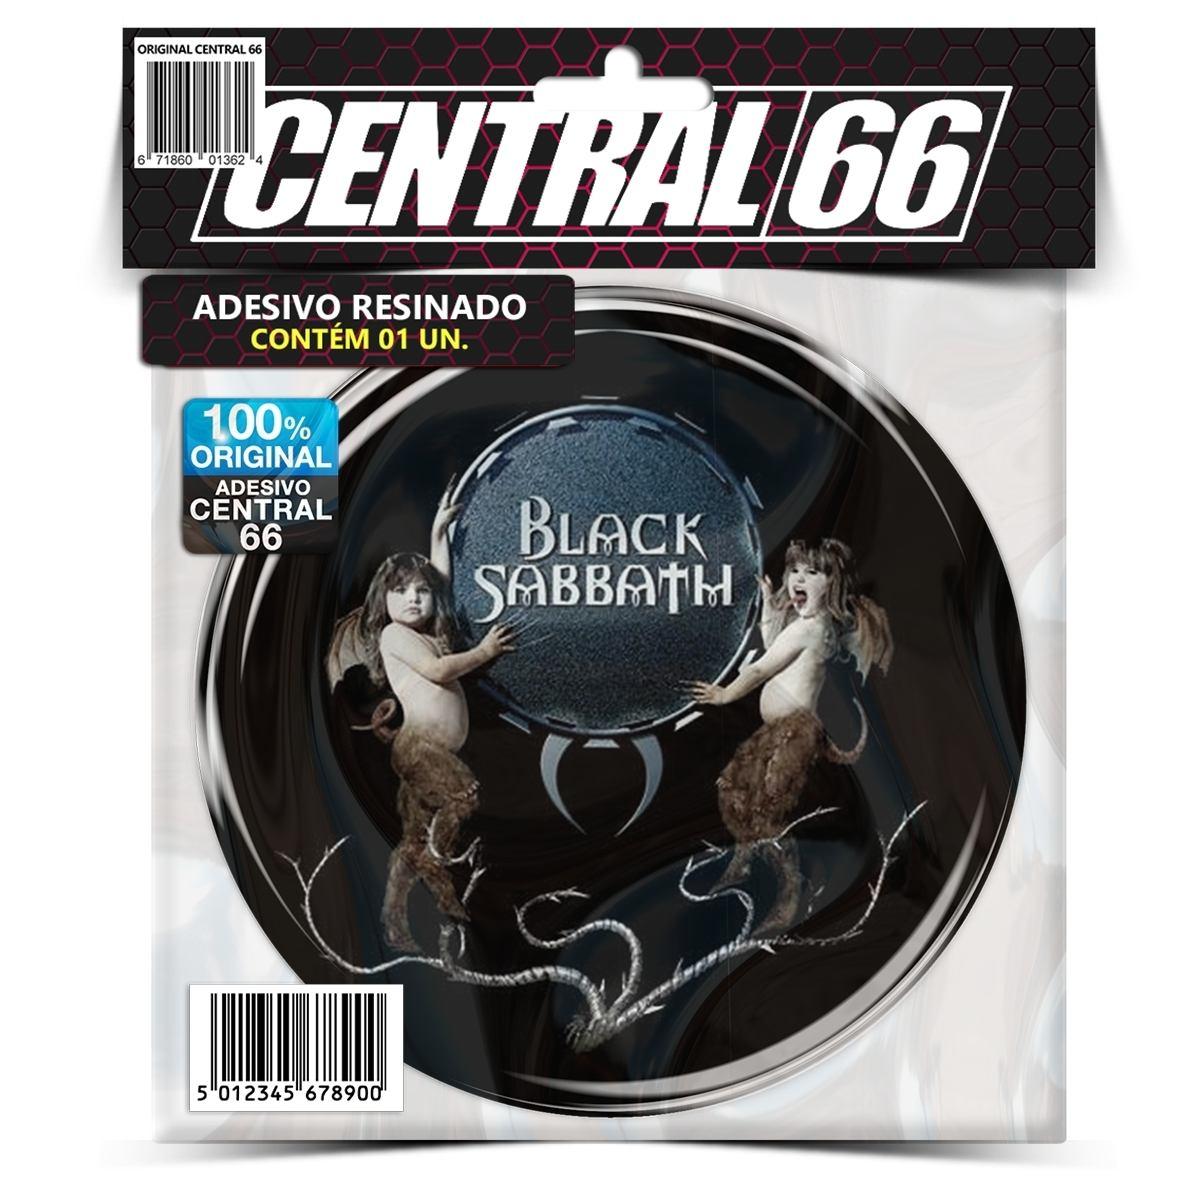 Adesivo Redondo Black Sabbath M01 – Central 66